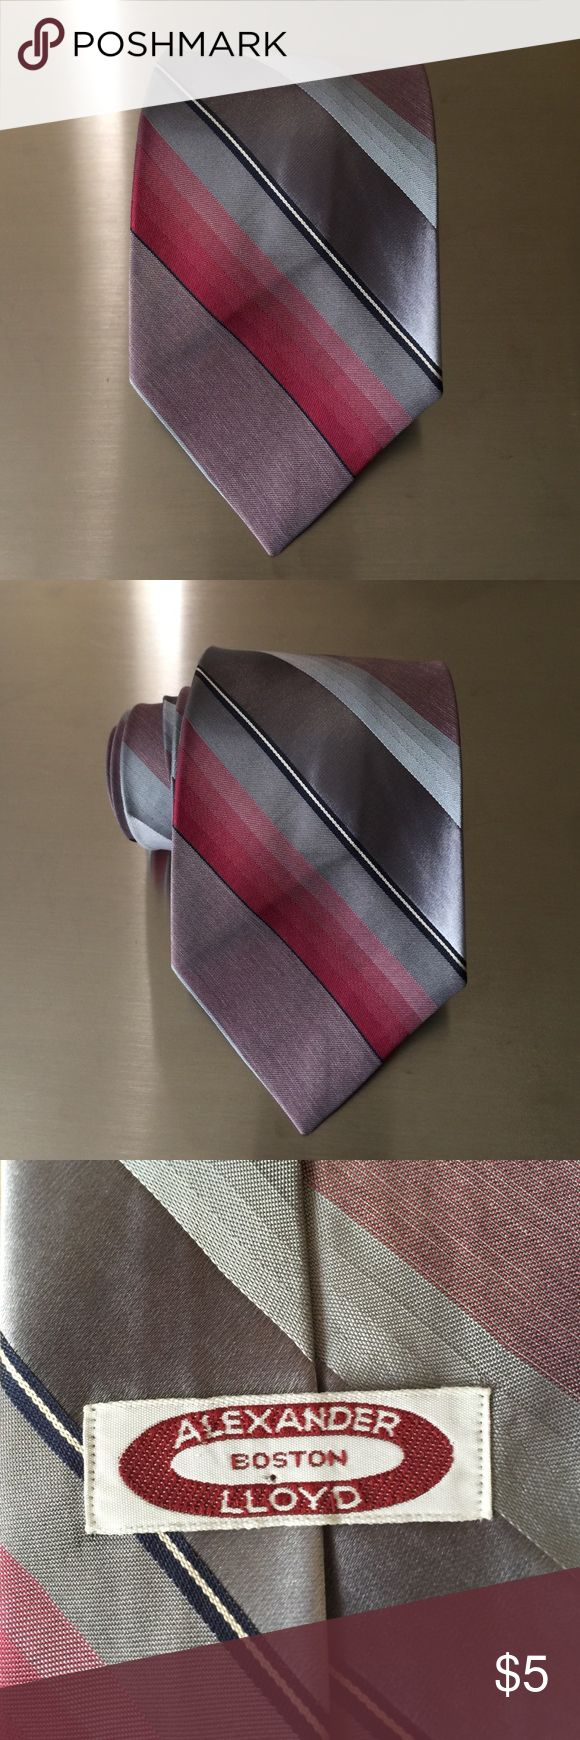 Alexander Lloyd Boston Striped Tie Alexander Lloyd Boston Striped Tie. Good condition. Alexander Lloyd Accessories Ties